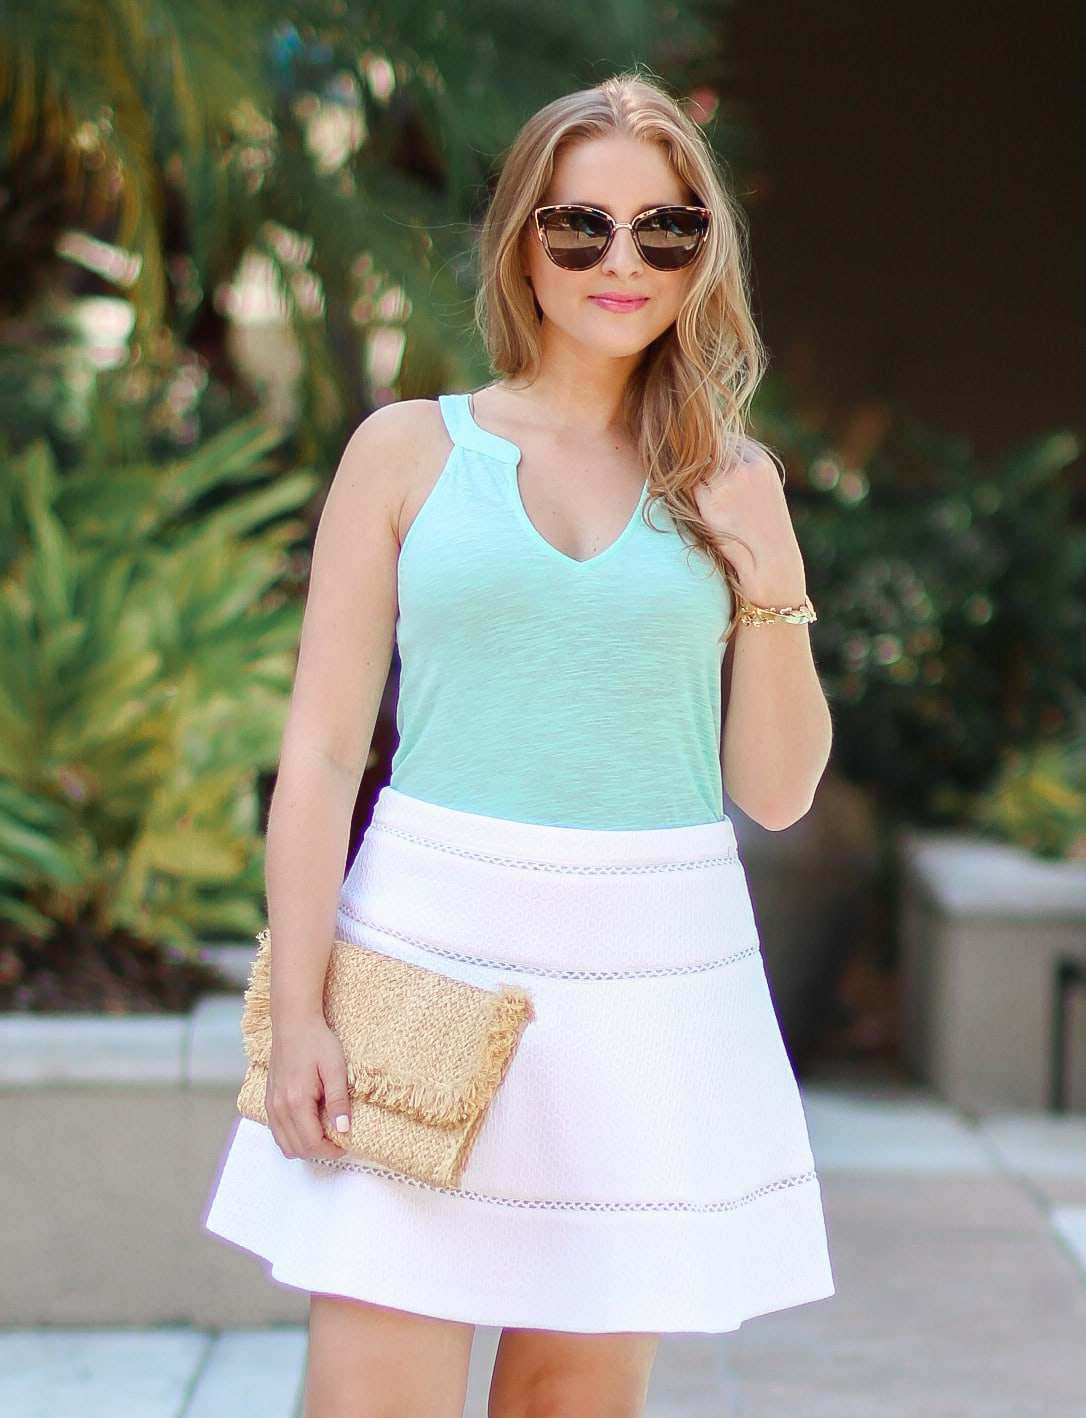 lilly-pulitzer-arya-gold-pineapple-sandals-quay-my-girl-sunglasses-banana-republic-white-skirt-ashley-brooke-3109